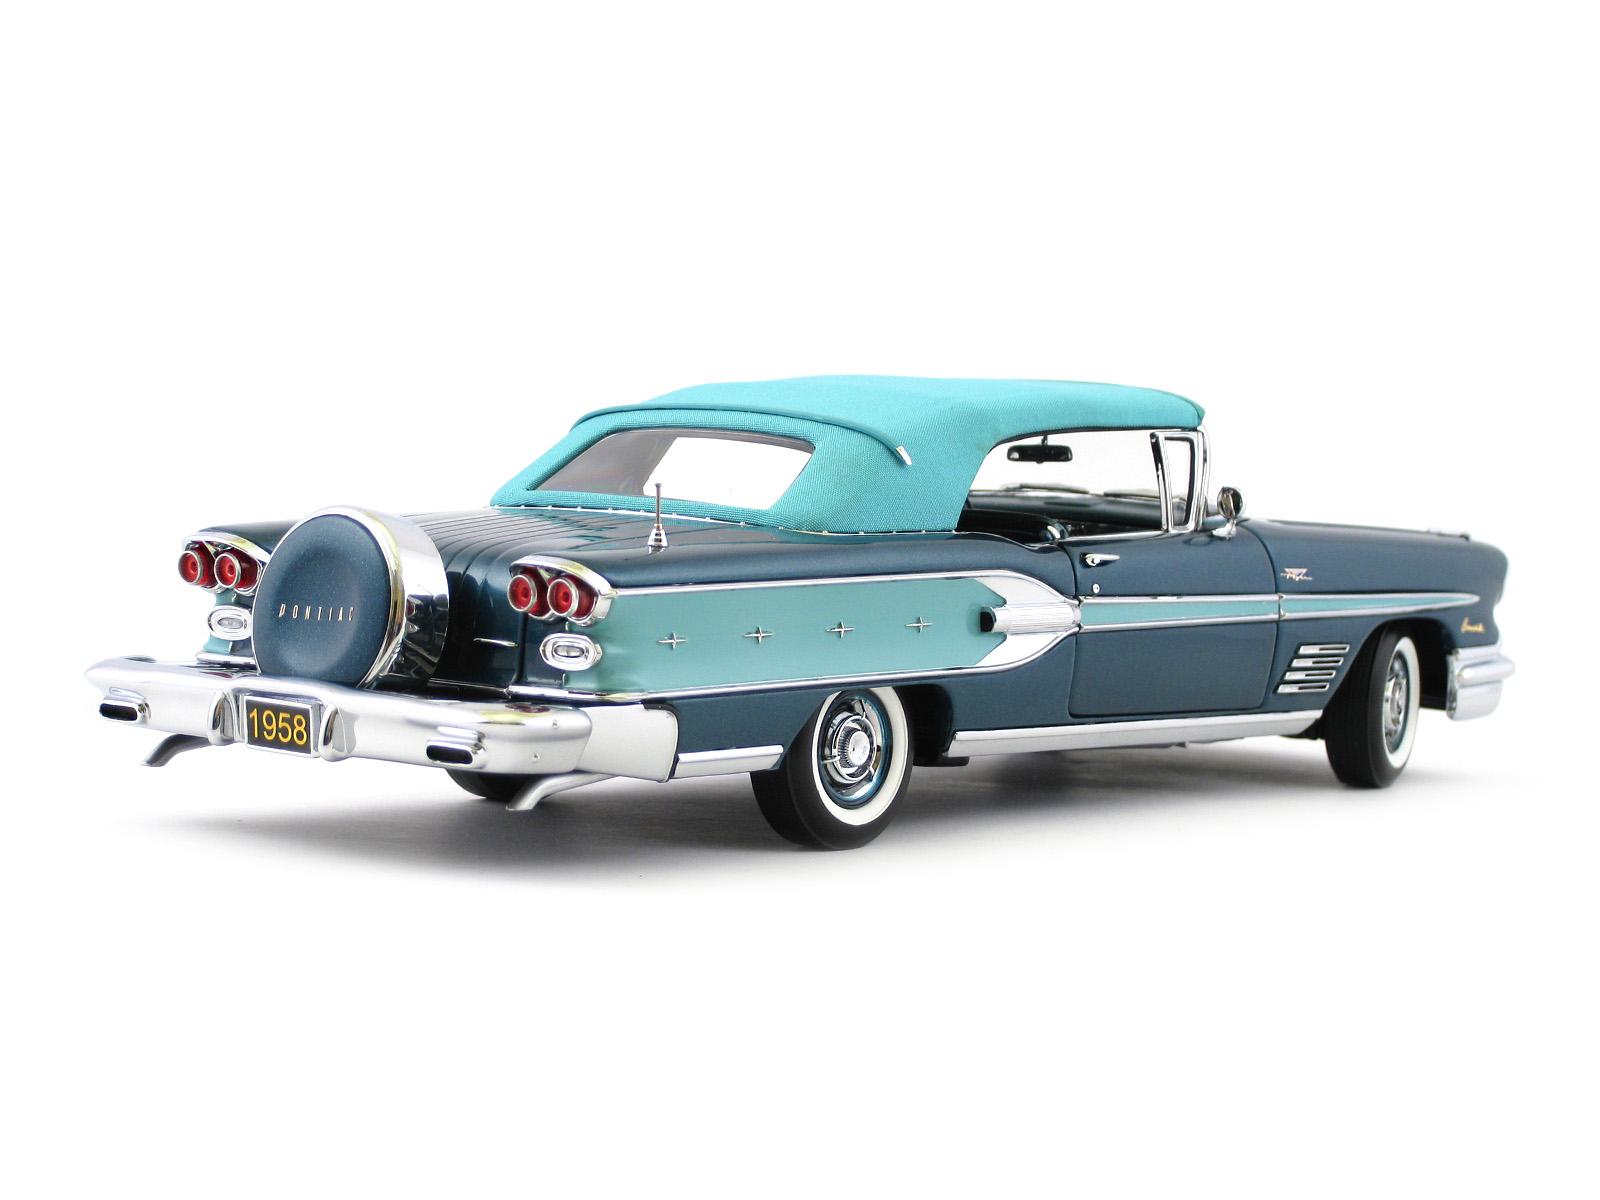 1958 Pontiac Bonneville Convertible Danbury Mint